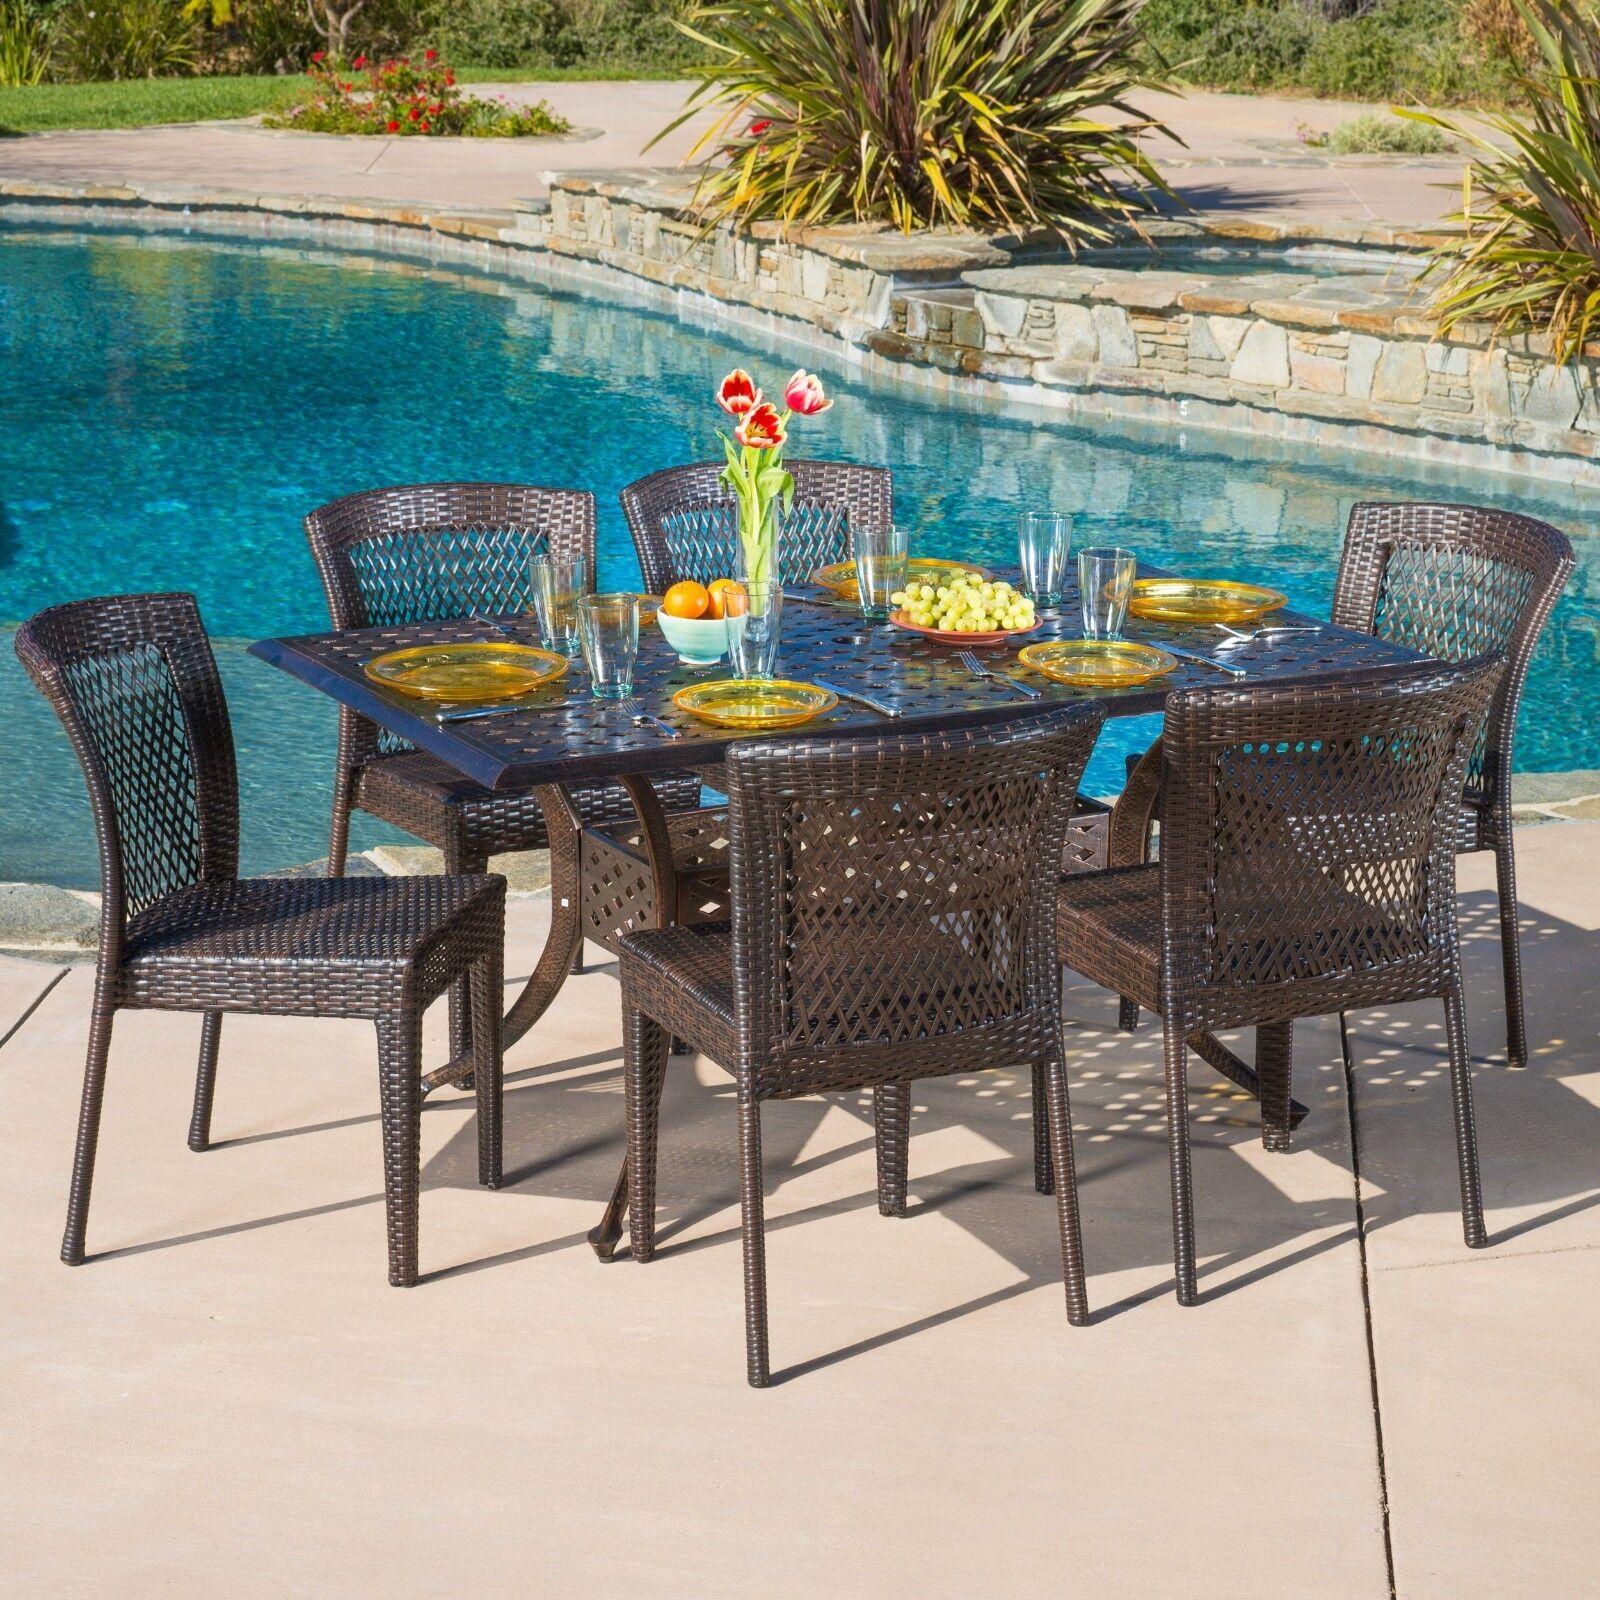 Outdoor Patio Furniture 7pc Florence Cast Aluminum Wicker Dining